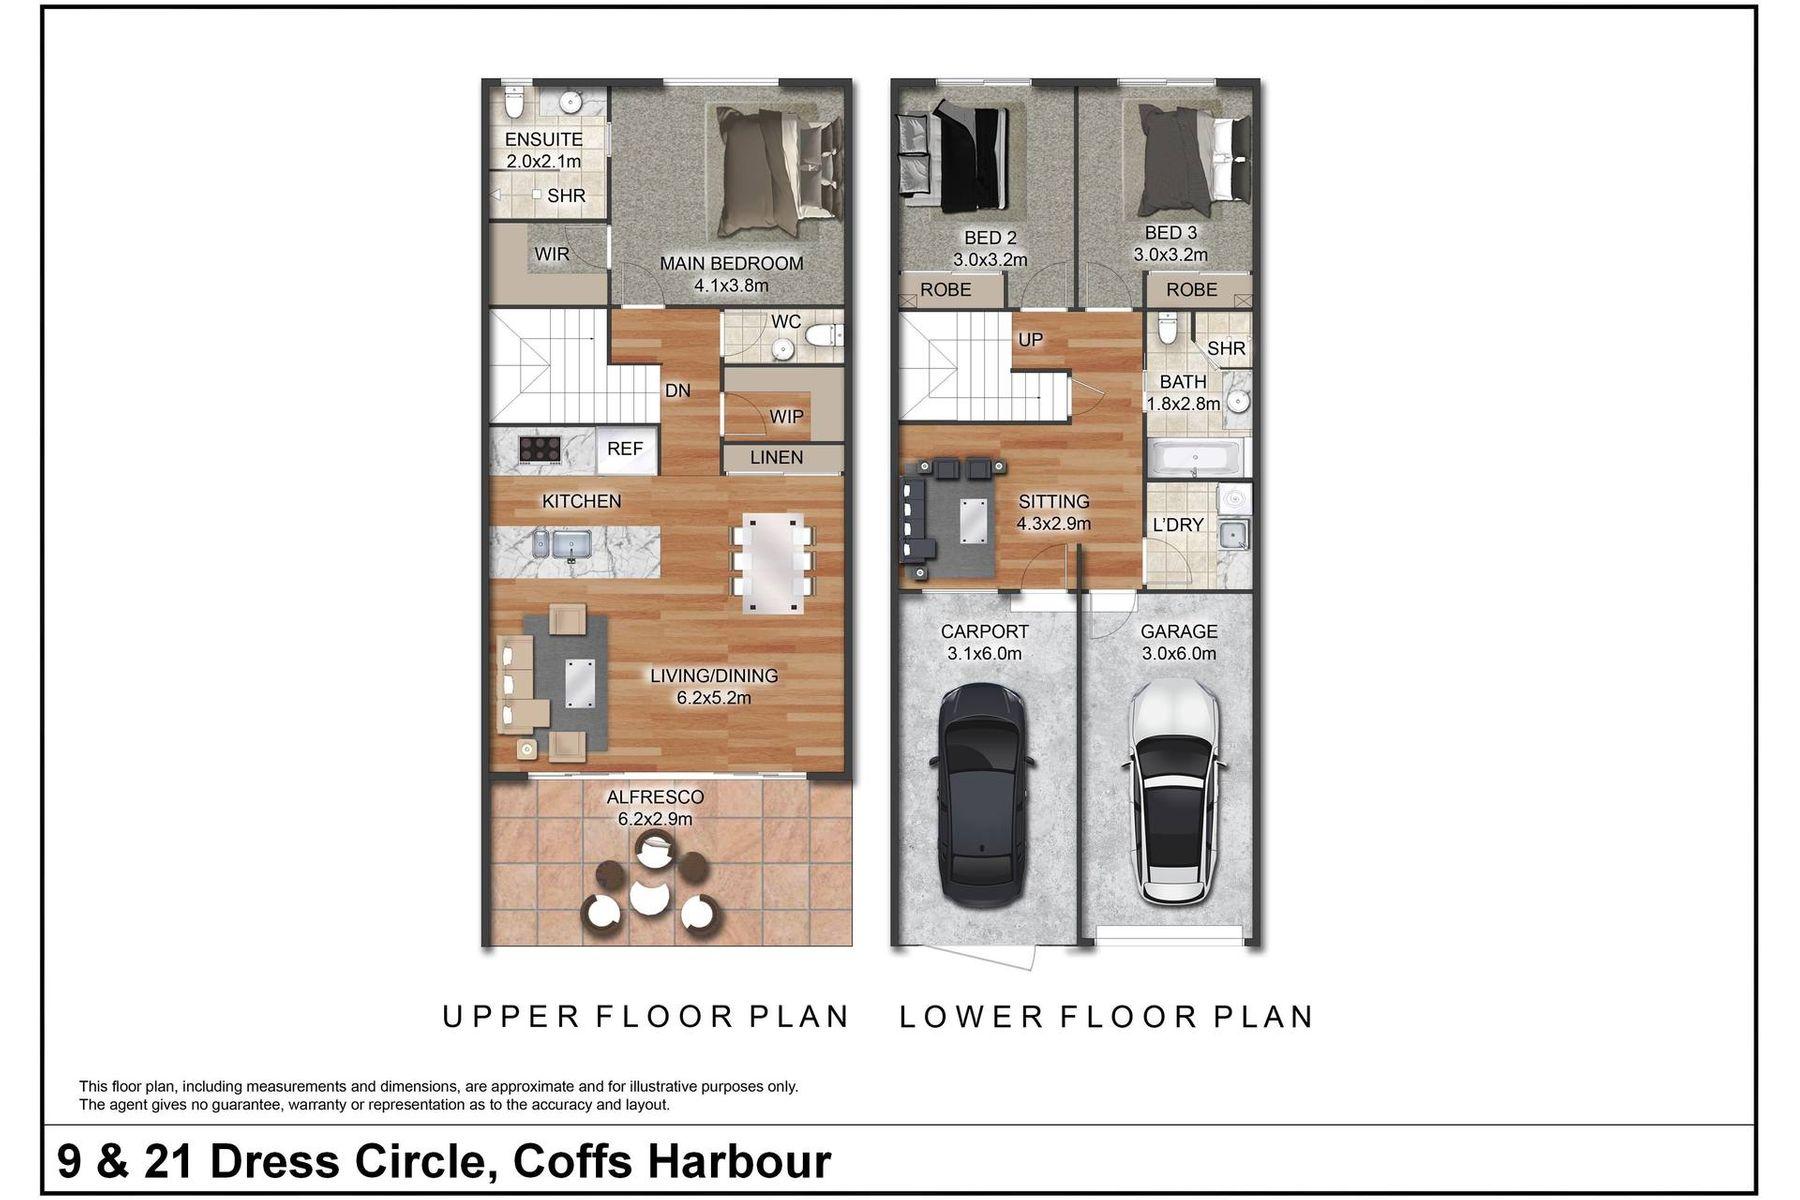 5-25 Dress Circle, Coffs Harbour, NSW 2450